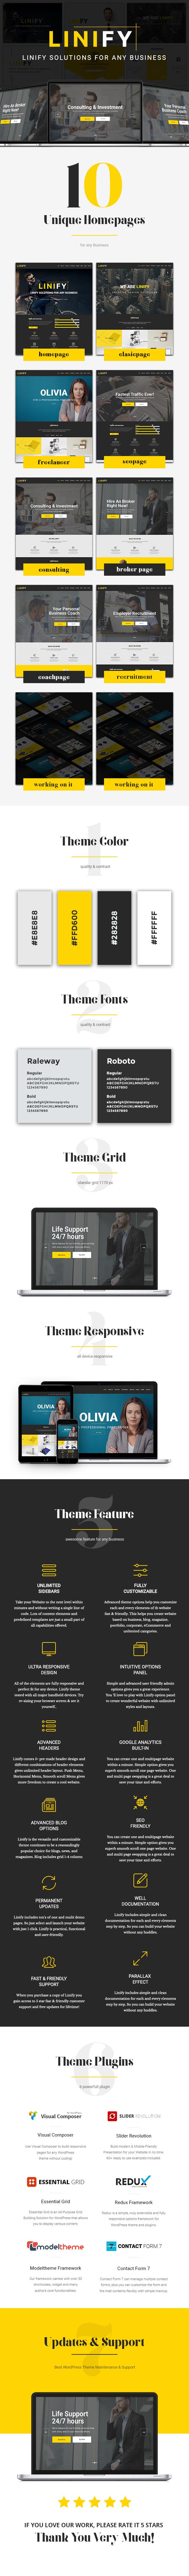 Linify - One Man Business WordPress Theme - 4